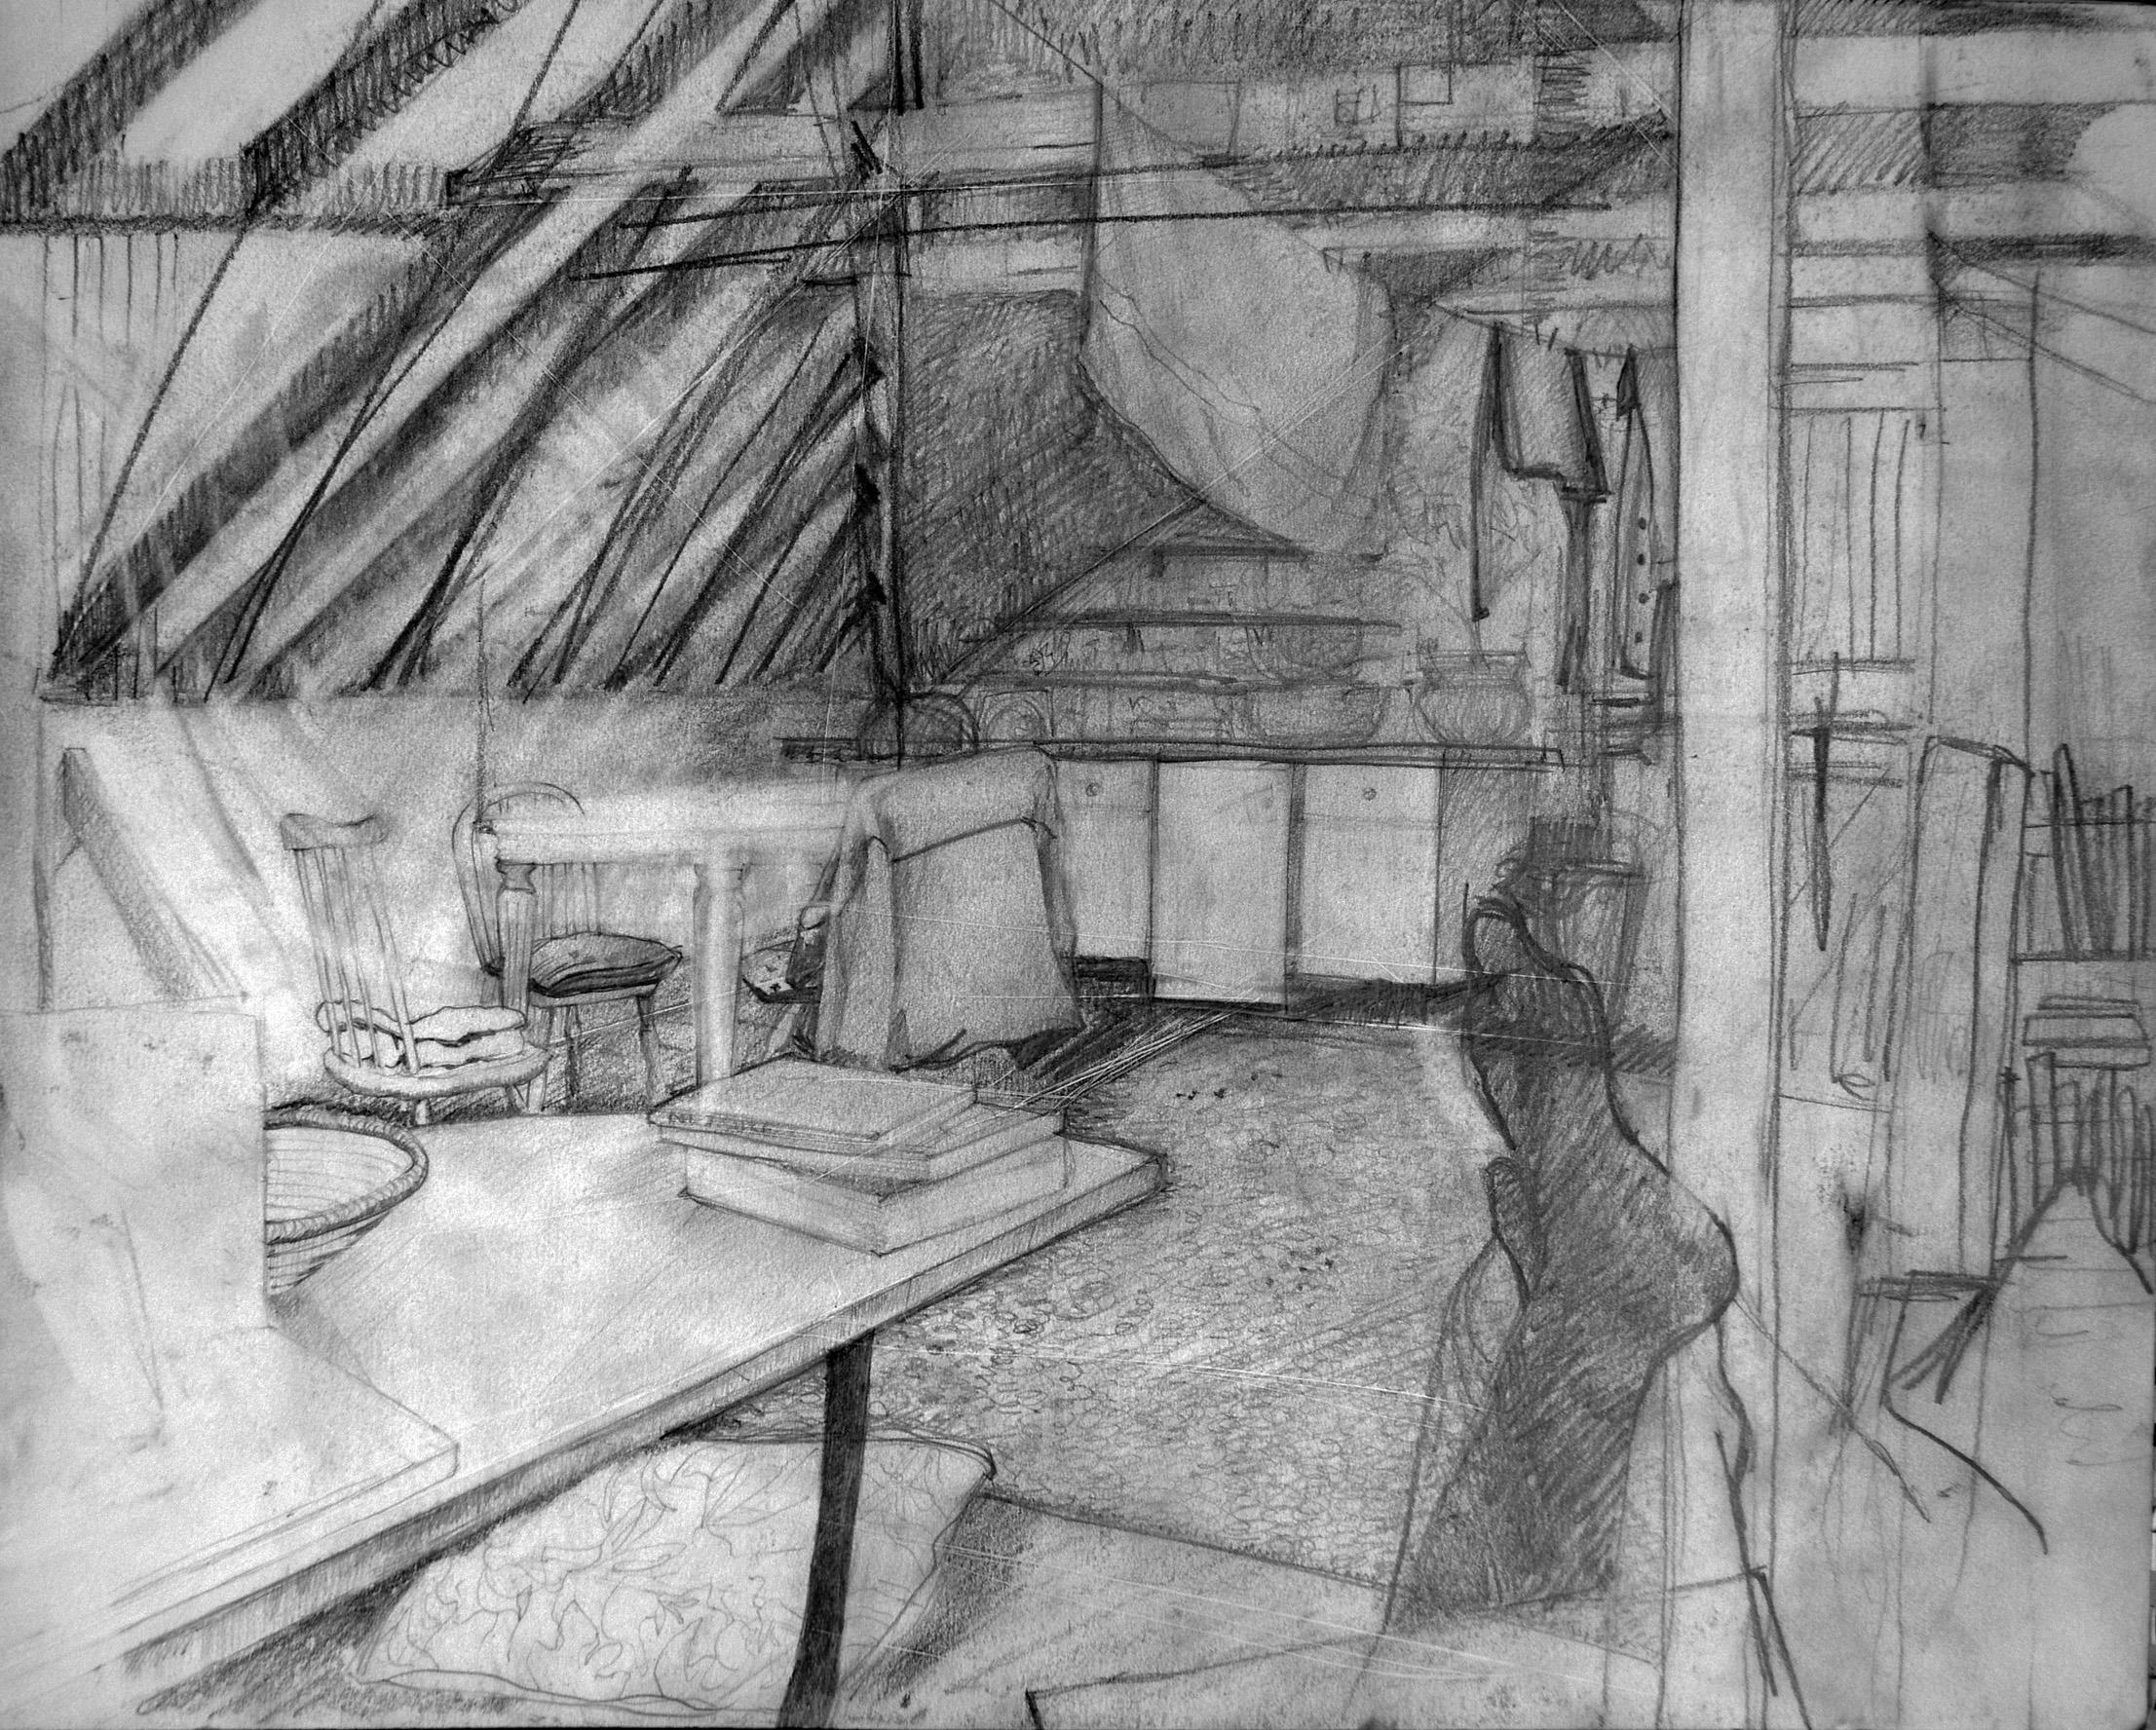 2. Untitled_30x37_pencil on paper .jpg